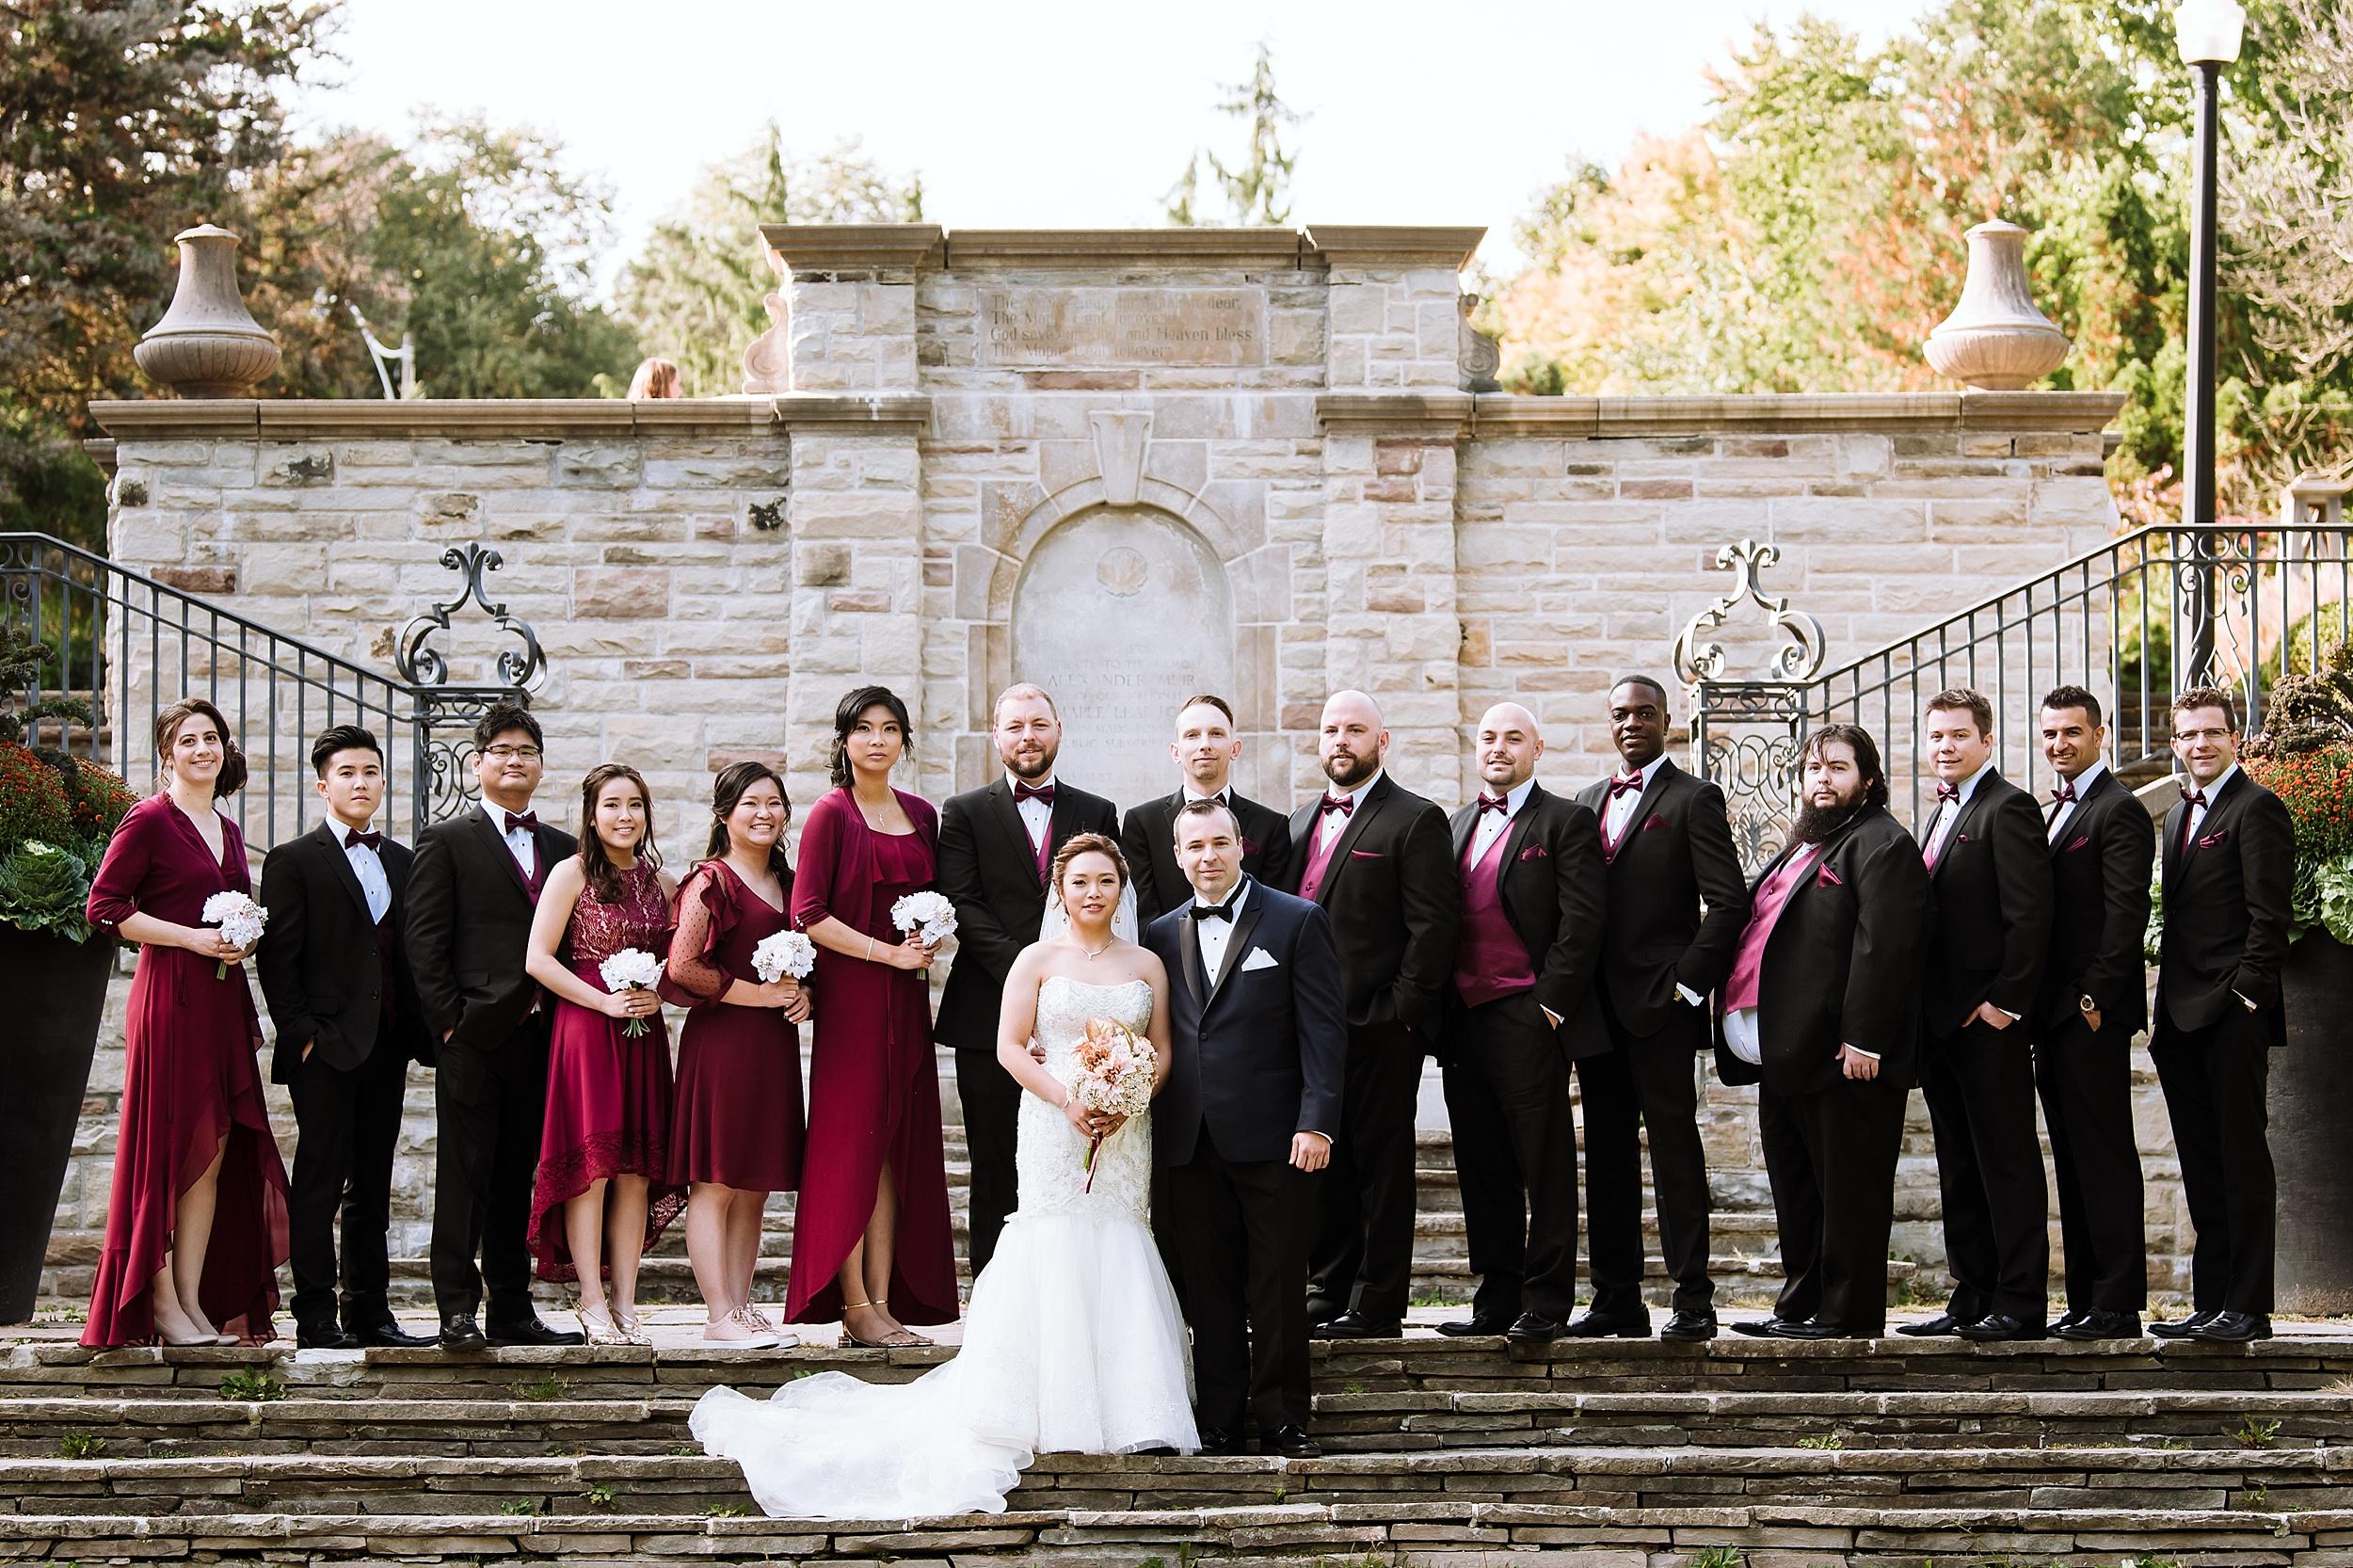 Sunnybrook_Estates_Alexander_Muir_Toronto_Wedding_Photographer_0031.jpg